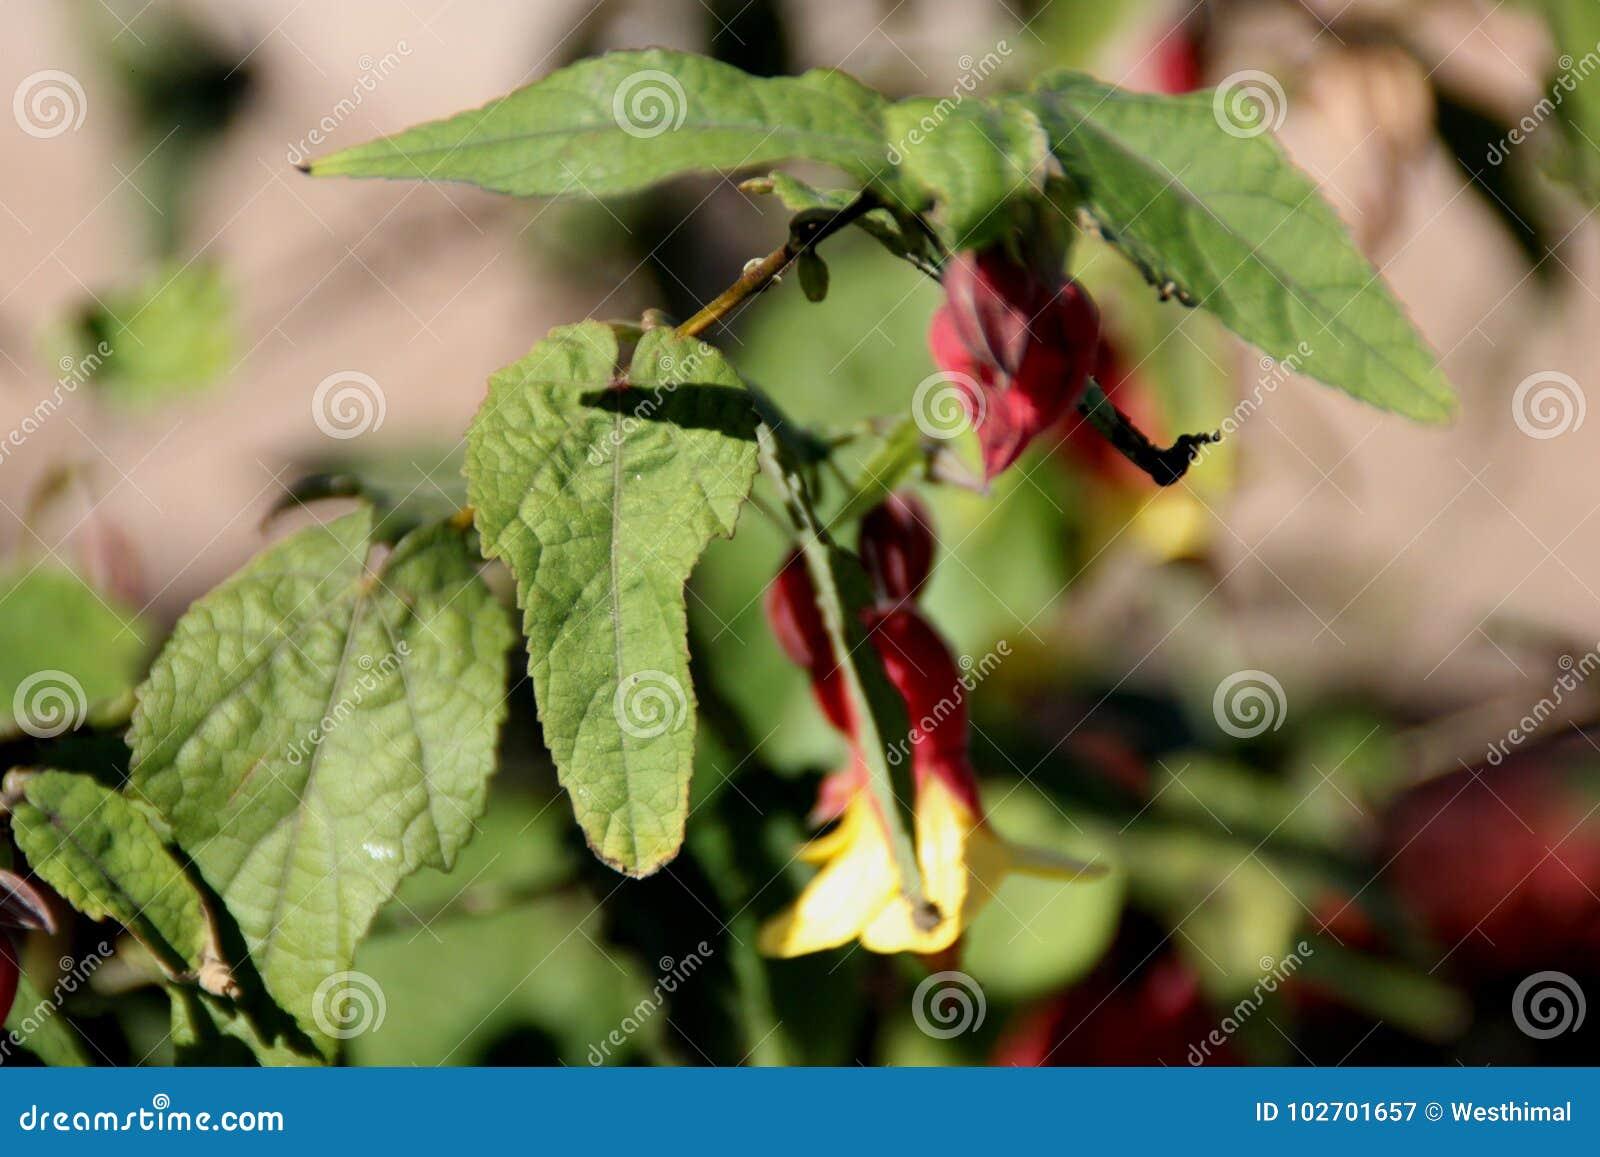 Brazilian Bellflower Trailing Abutilon Abutilon Megapotamicum